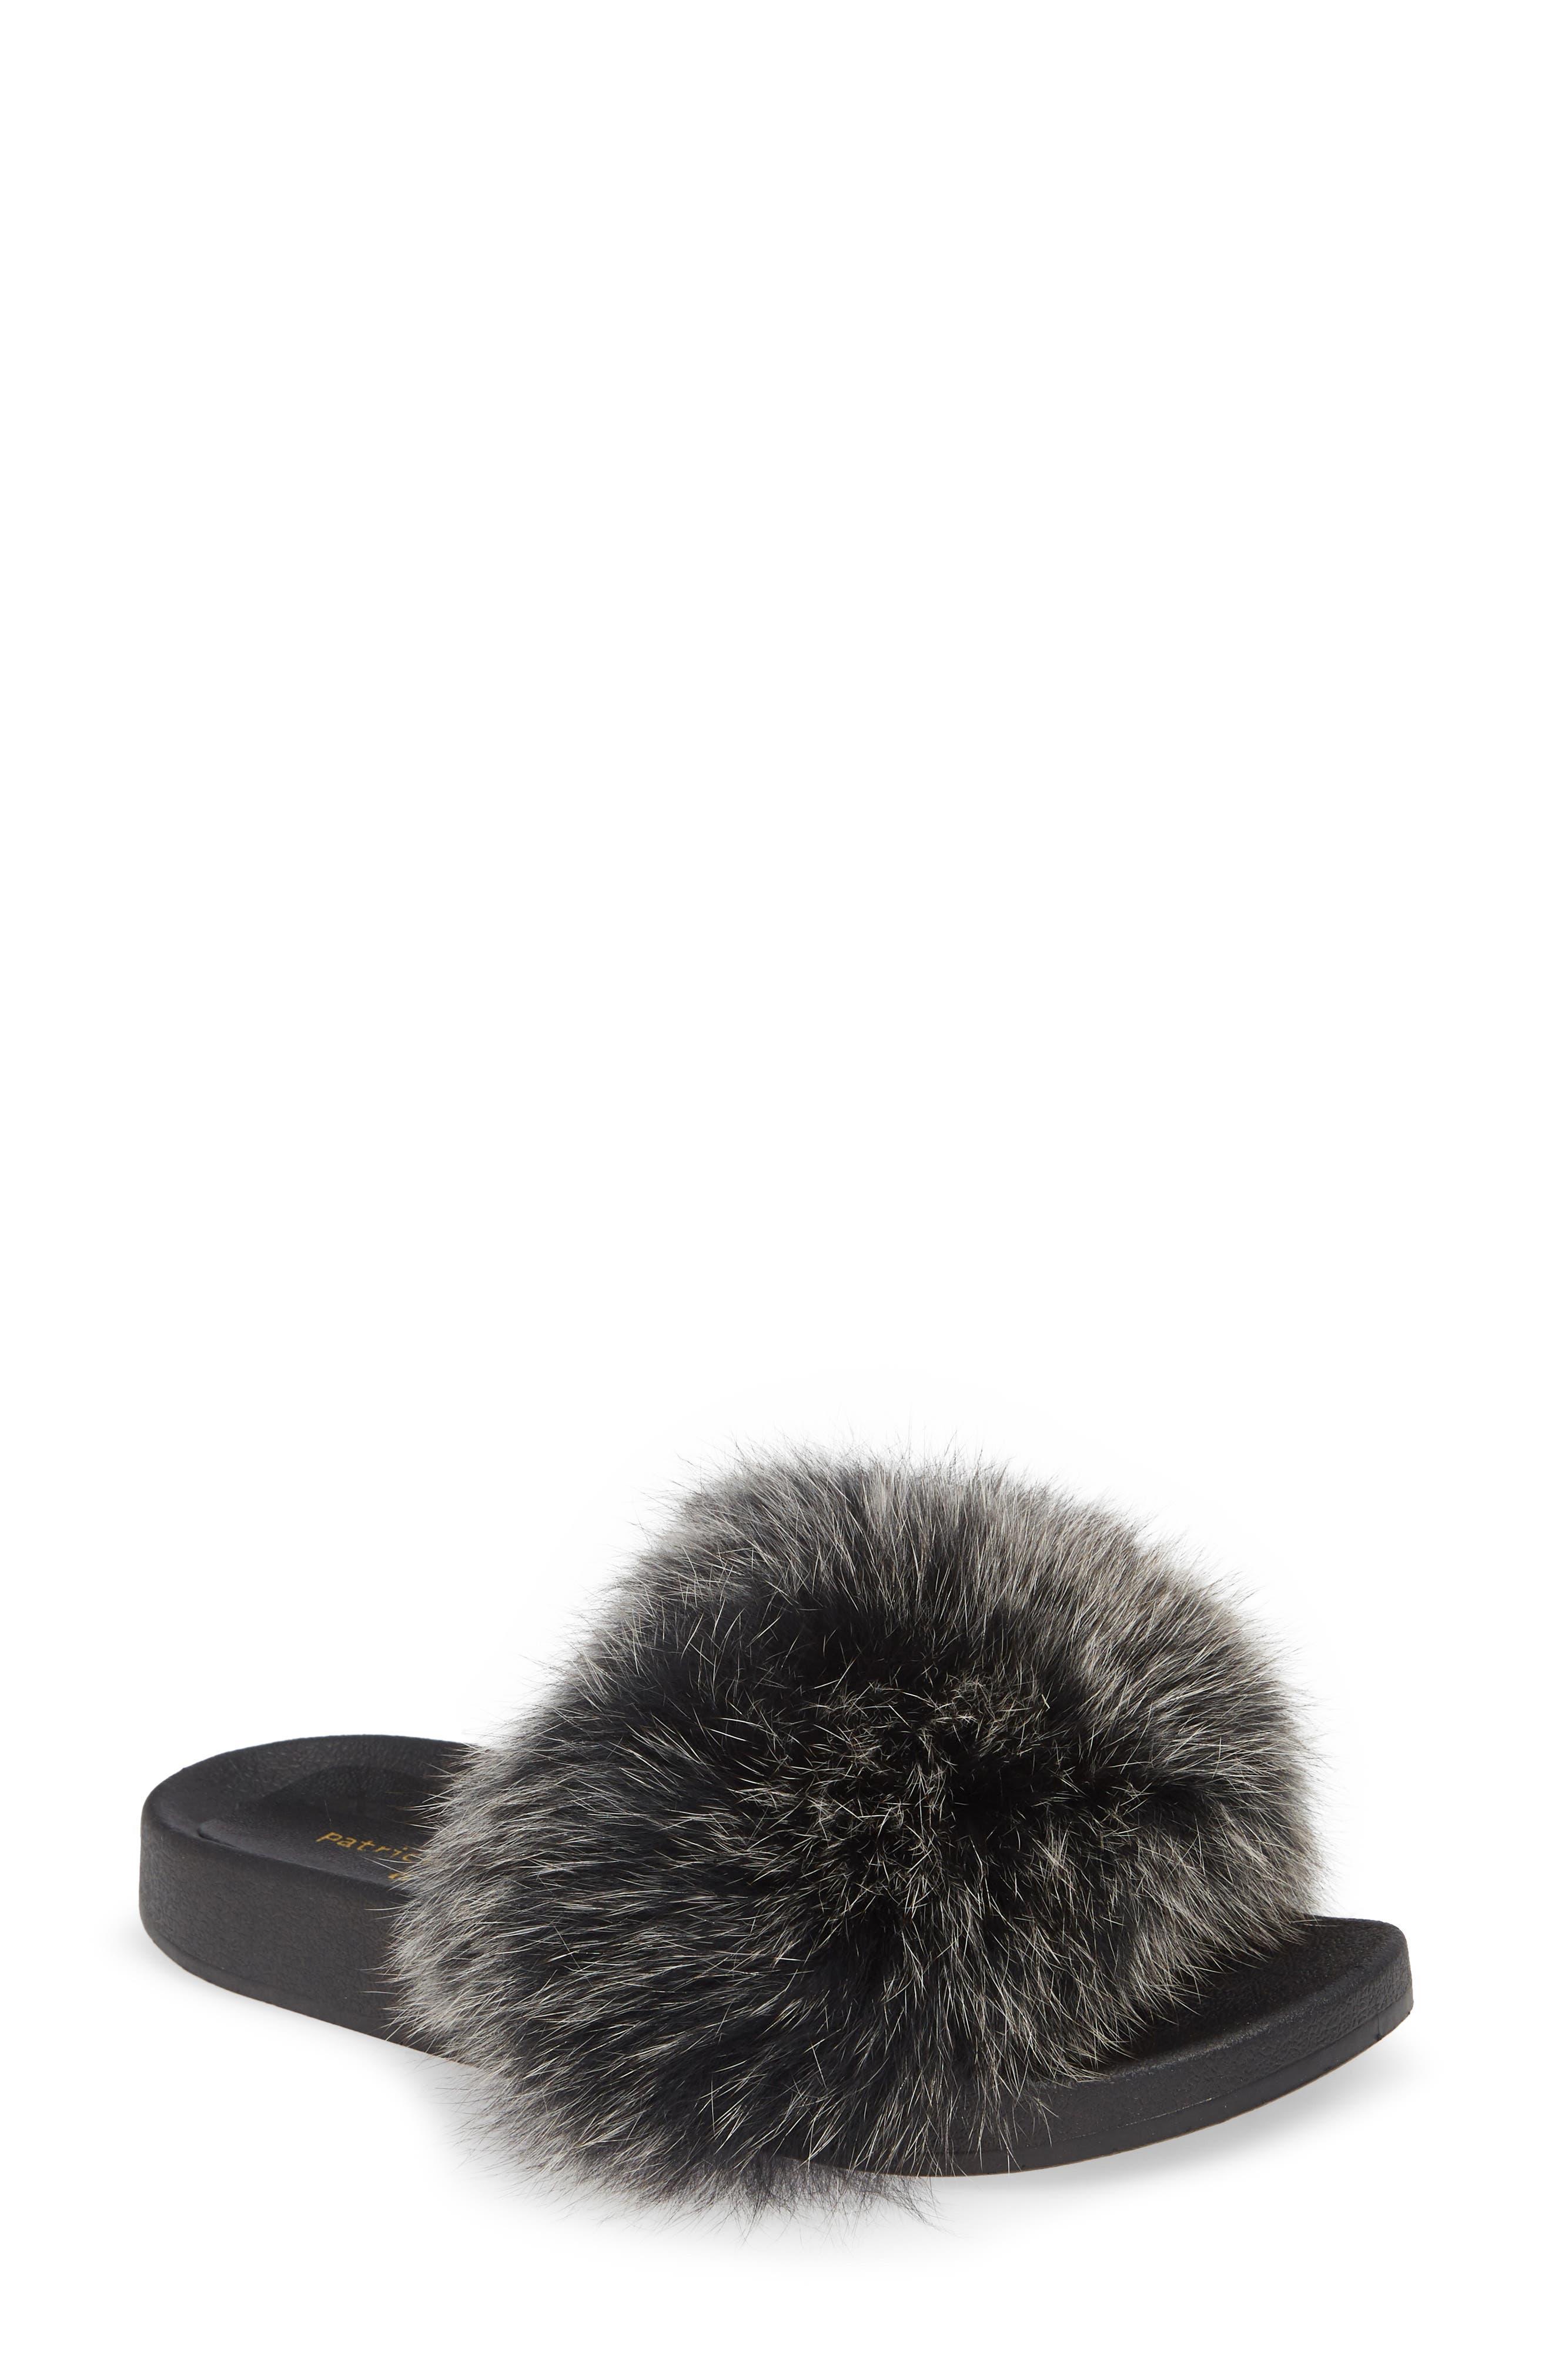 PATRICIA GREEN, Foxy Genuine Fox Fur Slipper, Main thumbnail 1, color, BLACK/ WHITE FUR